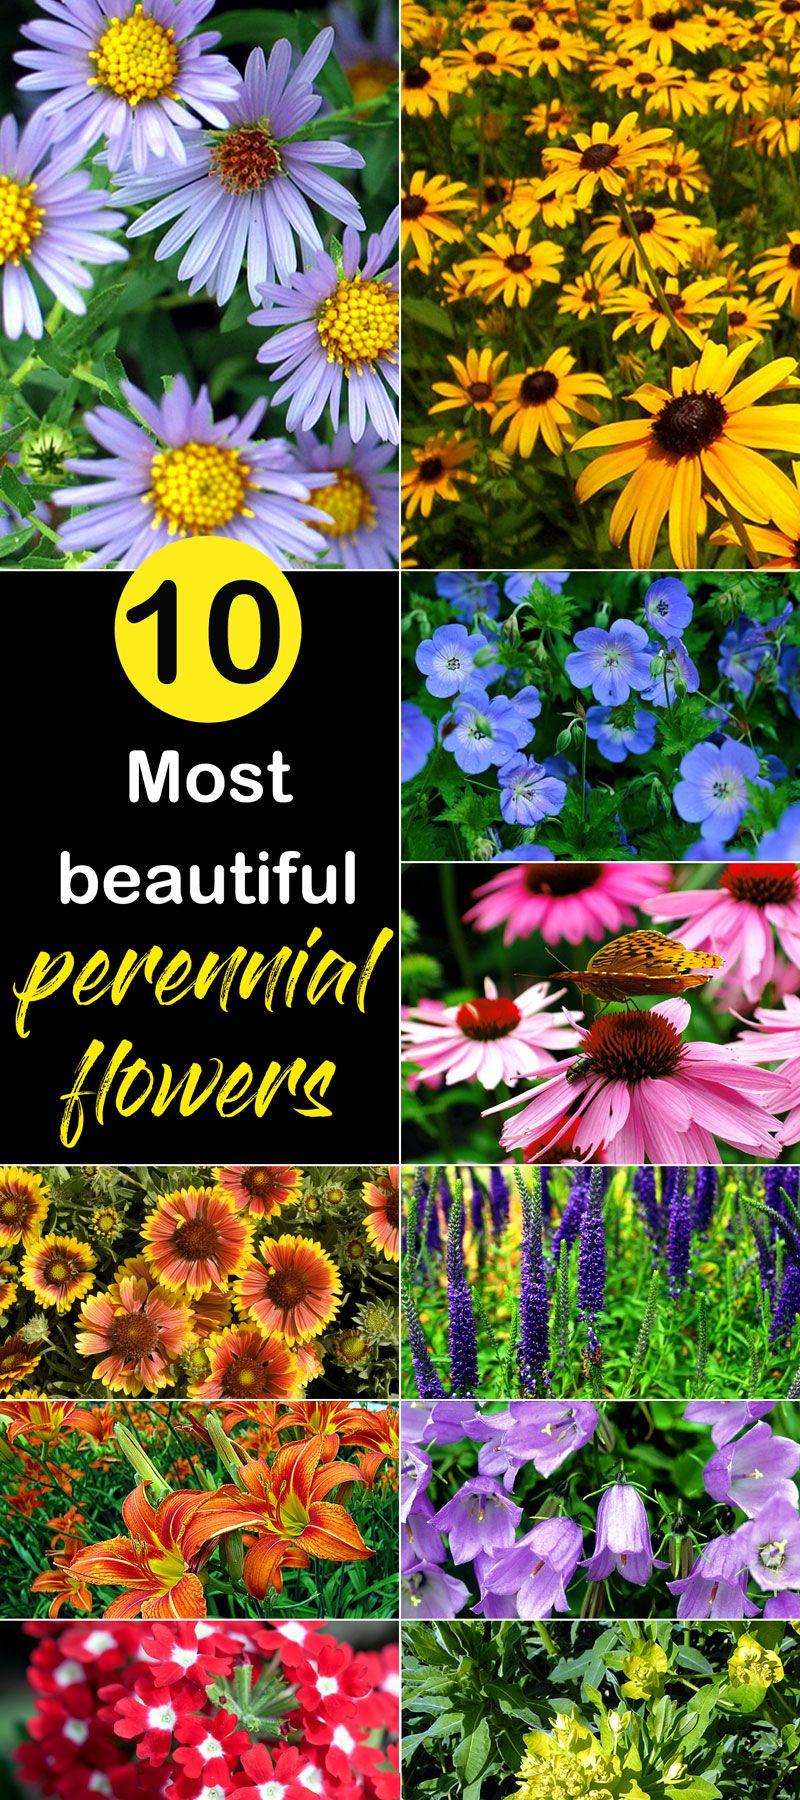 10 Most Beautiful Perennial Flowers Flowering Plants Pinterest